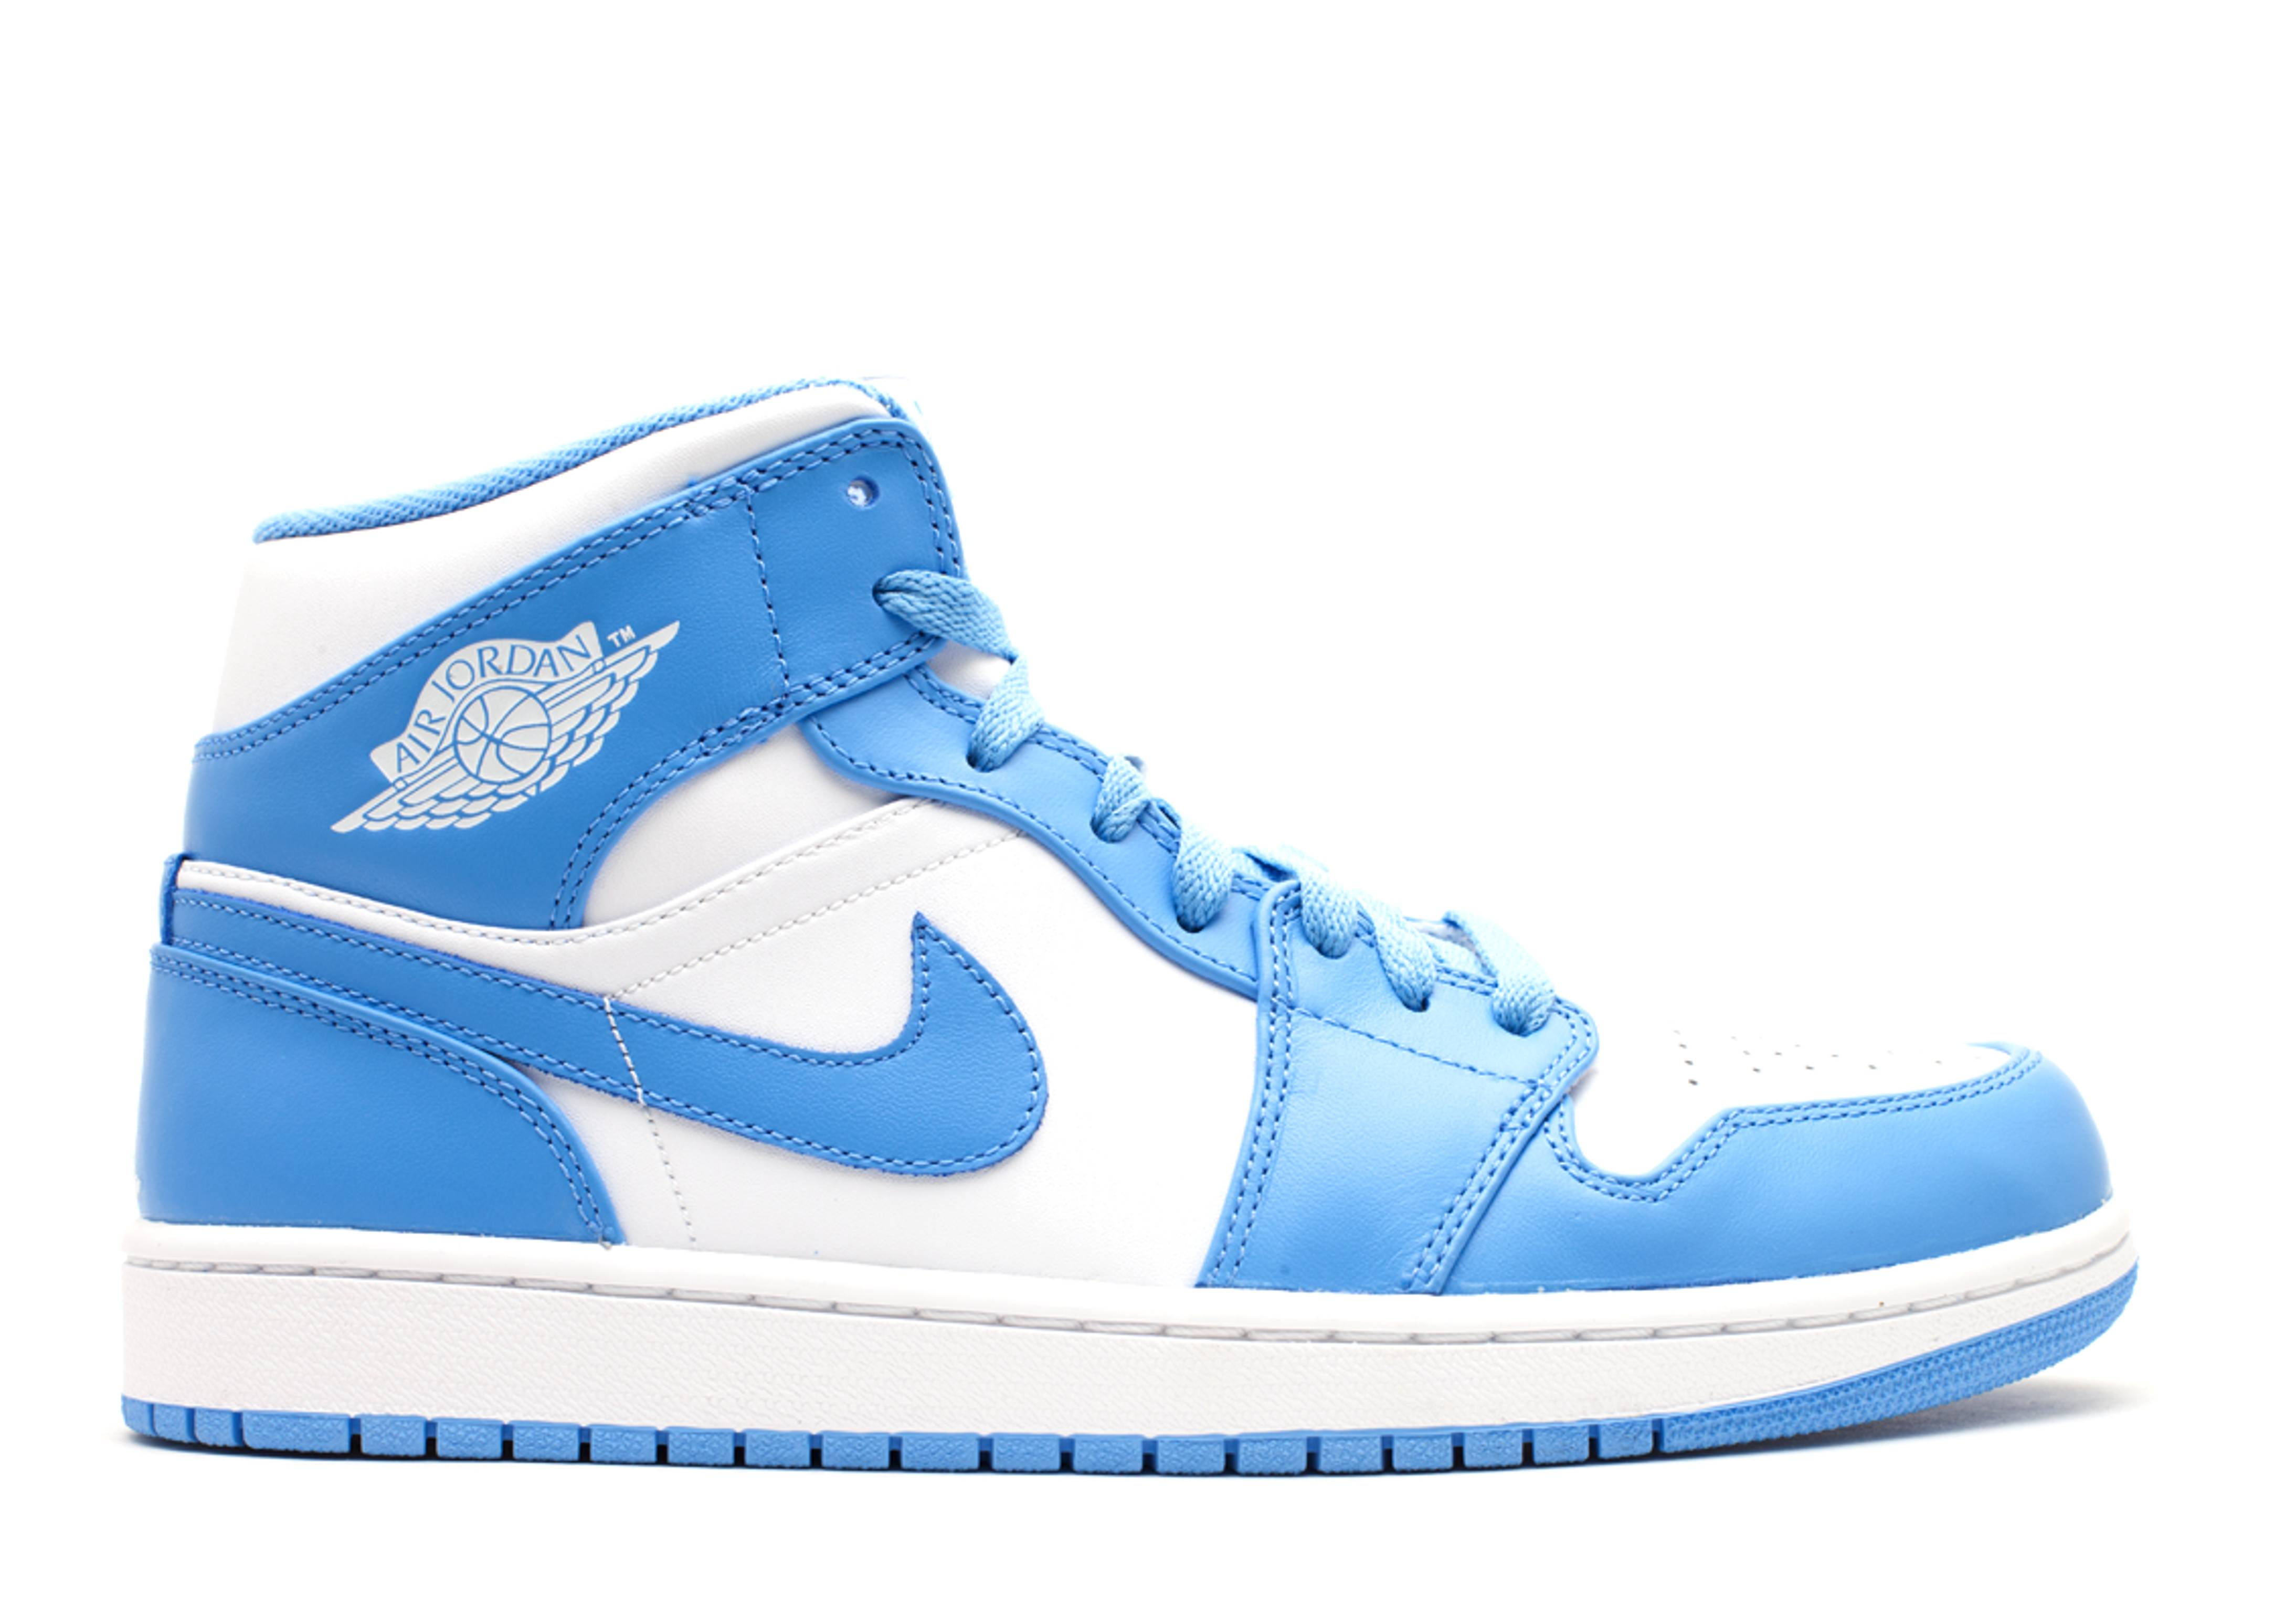 nike air jordan 1 mid white university blue